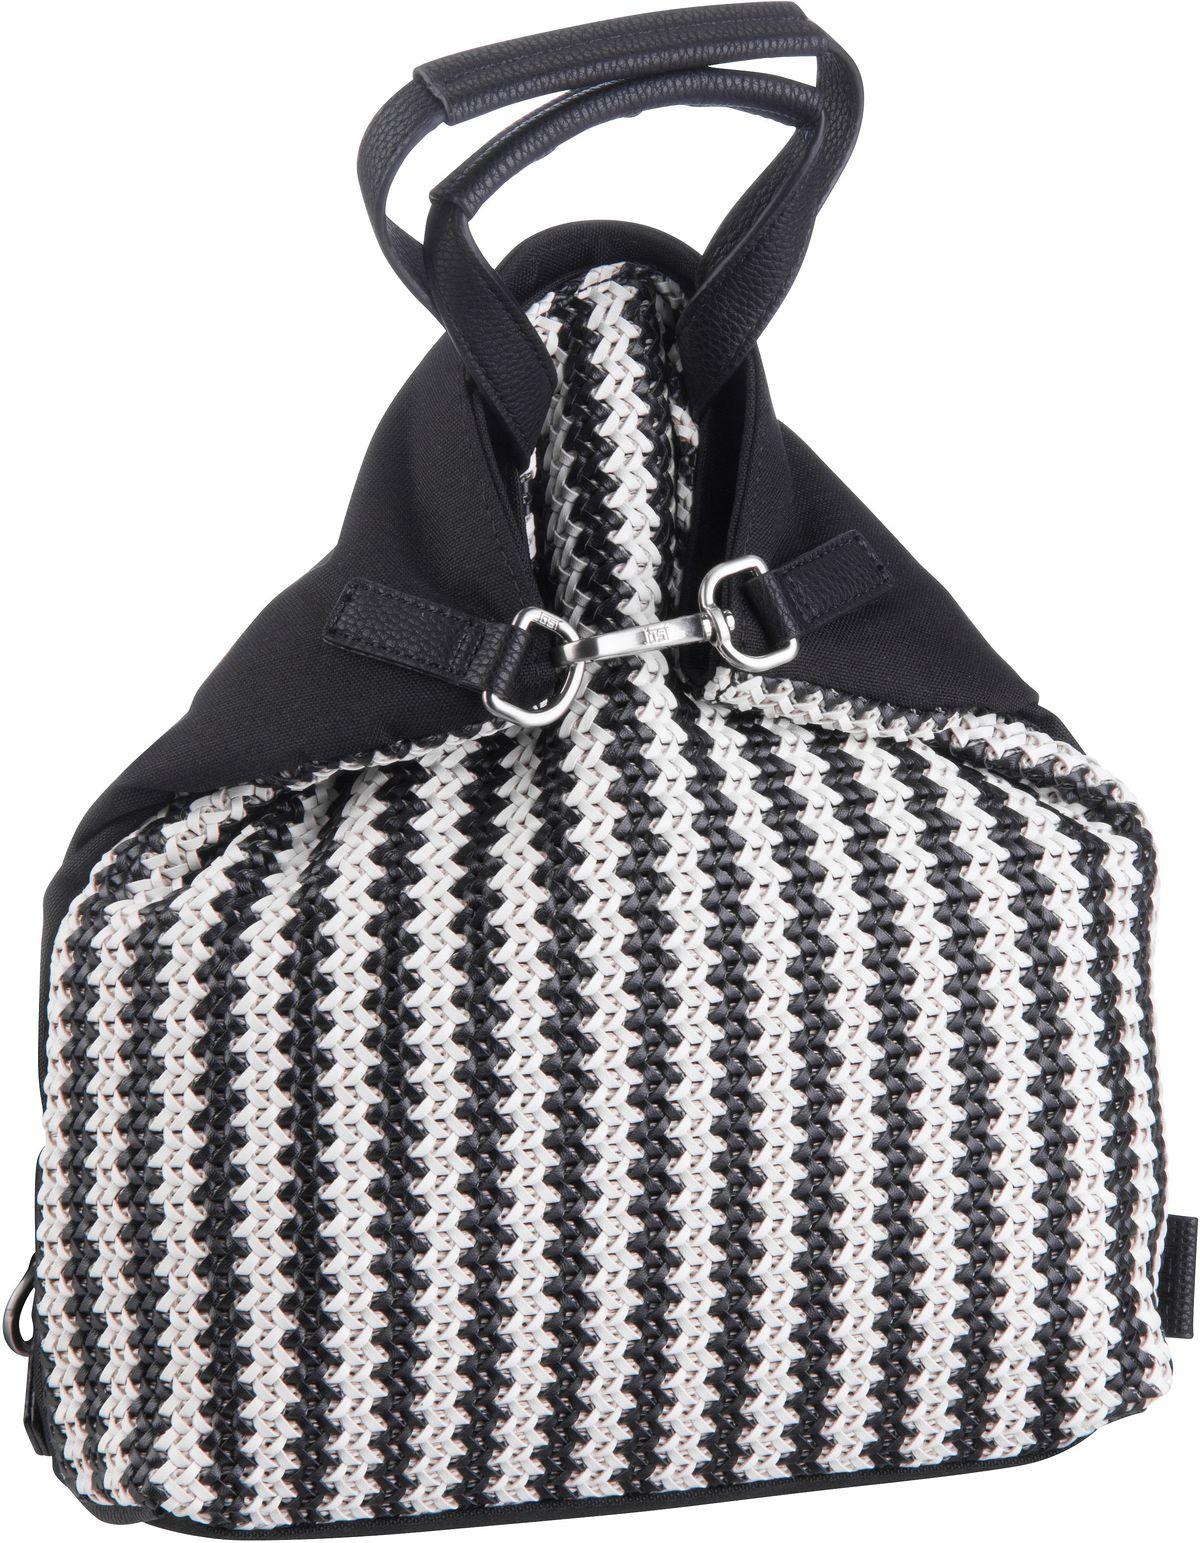 Rucksack / Daypack Redi 2527 X-Change Bag XS Schwarz (5.4 Liter)